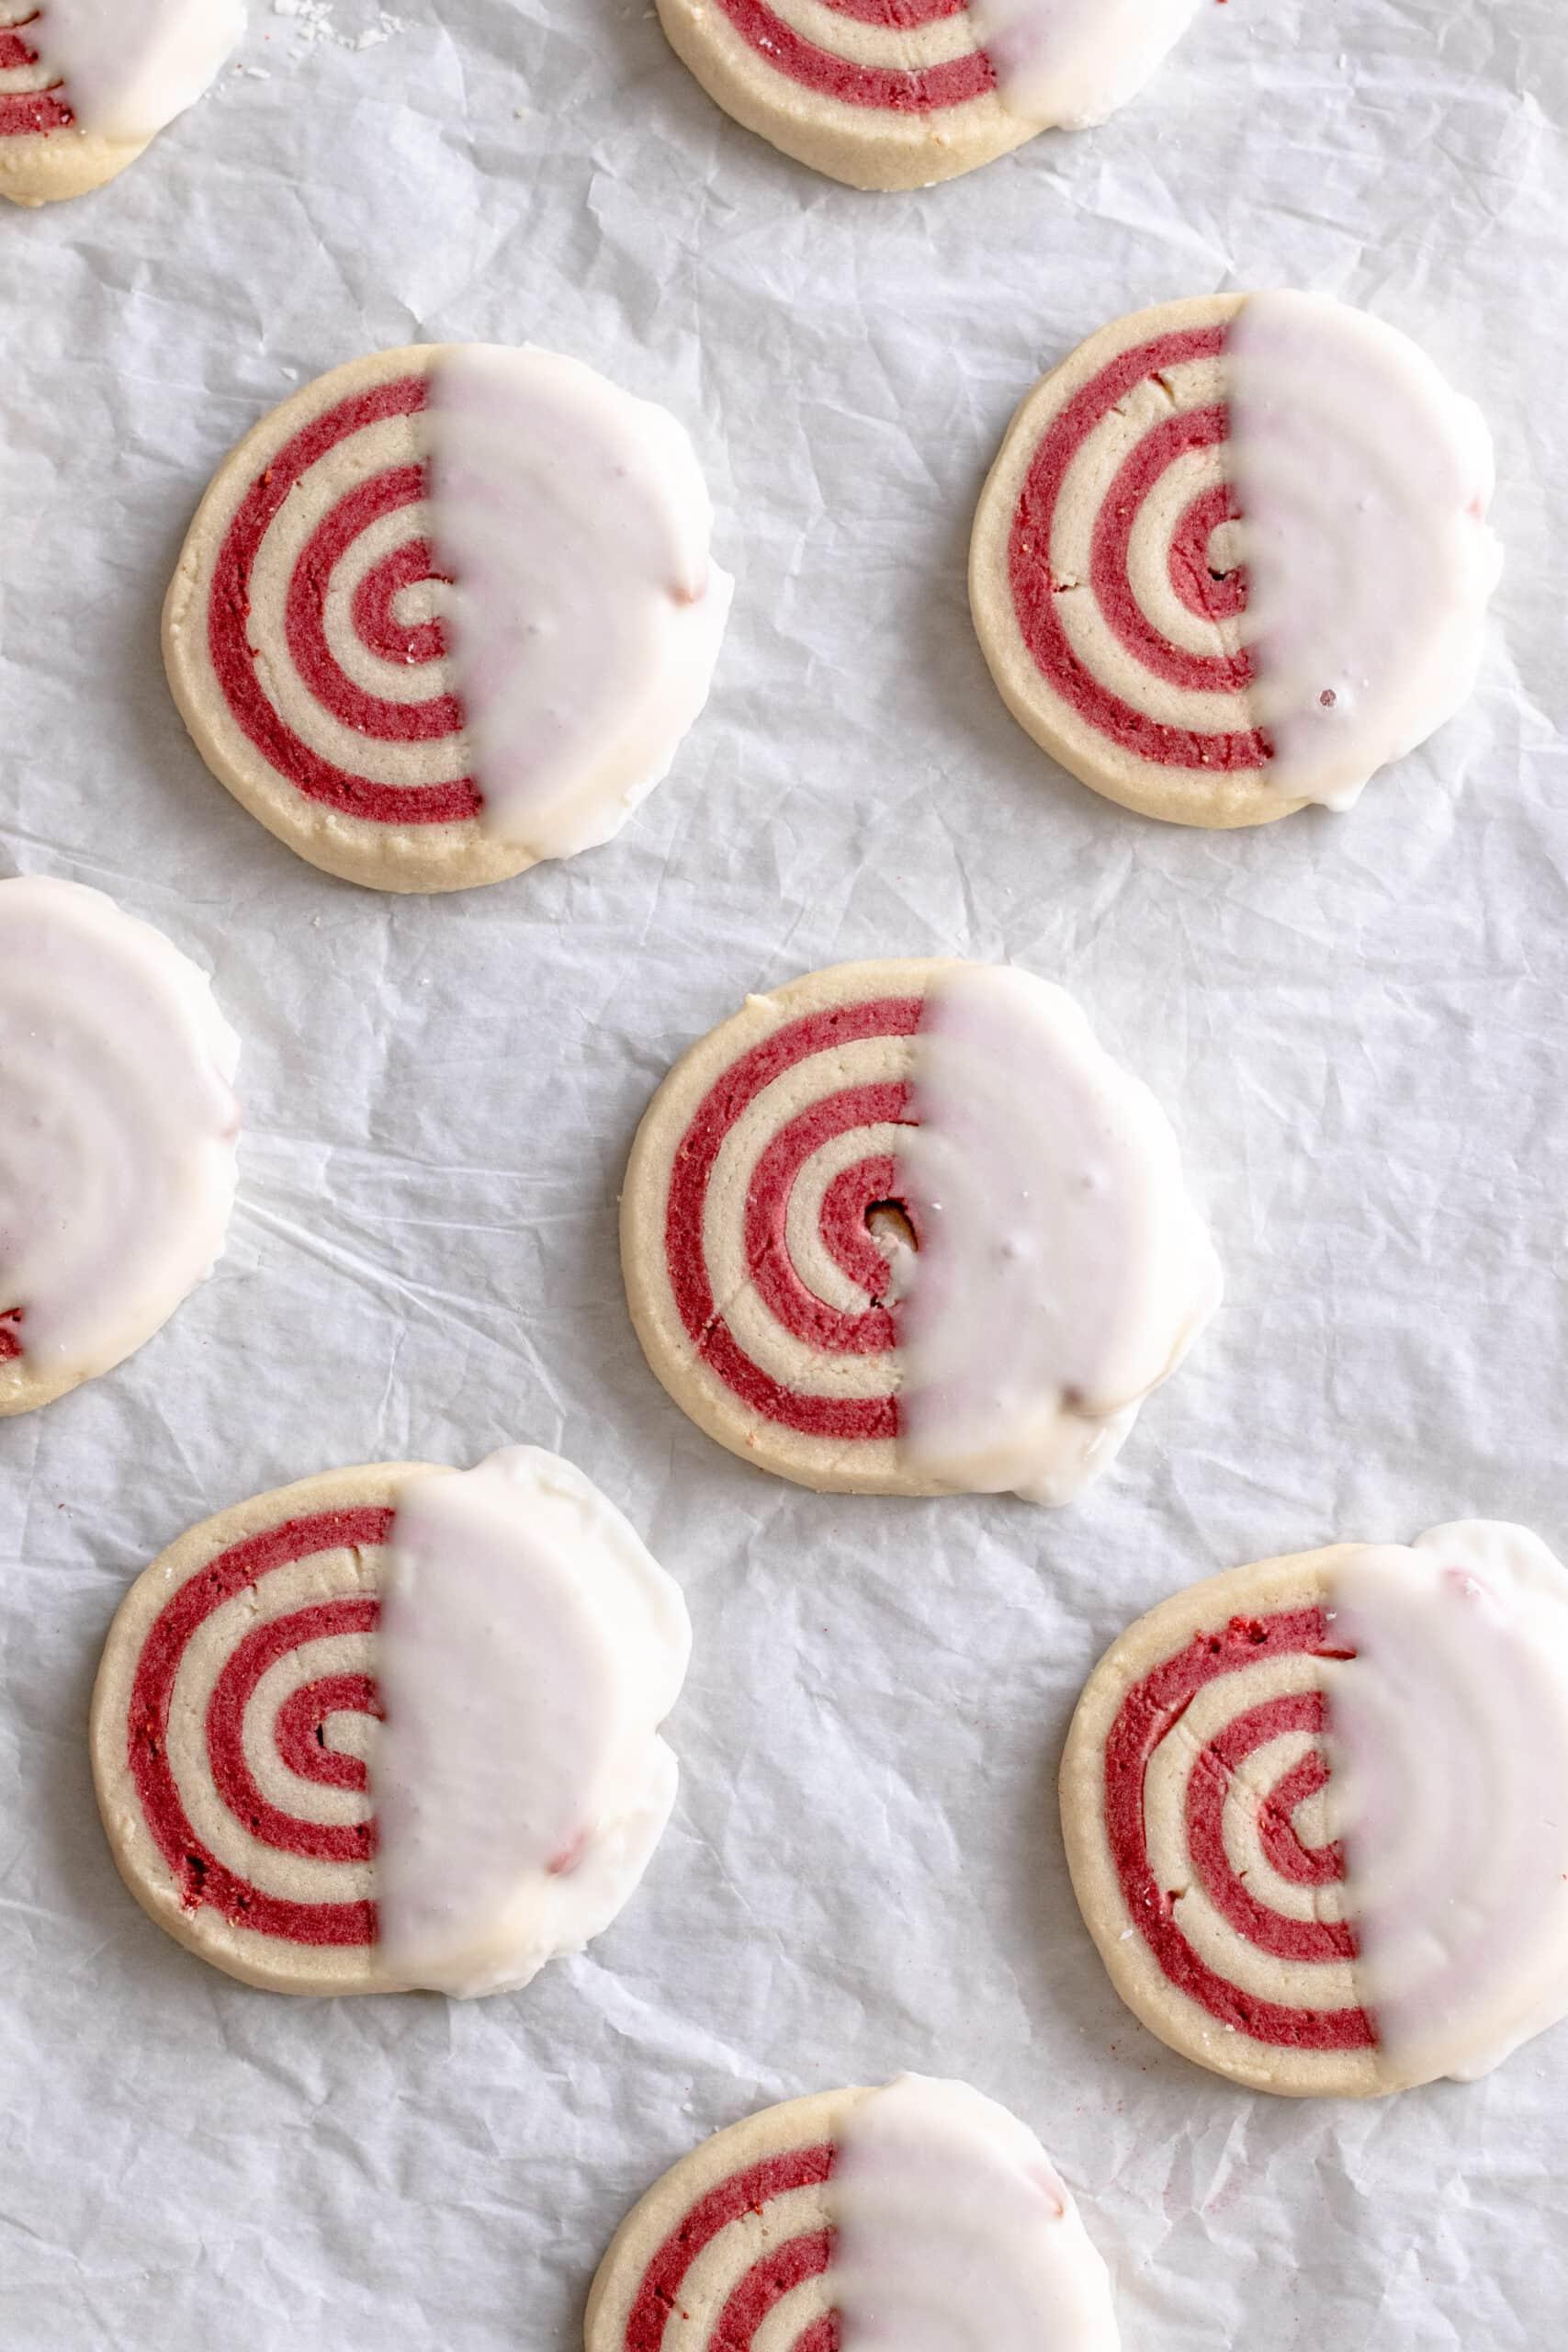 Image of iced strawberry and vanilla pinwheel cookies.